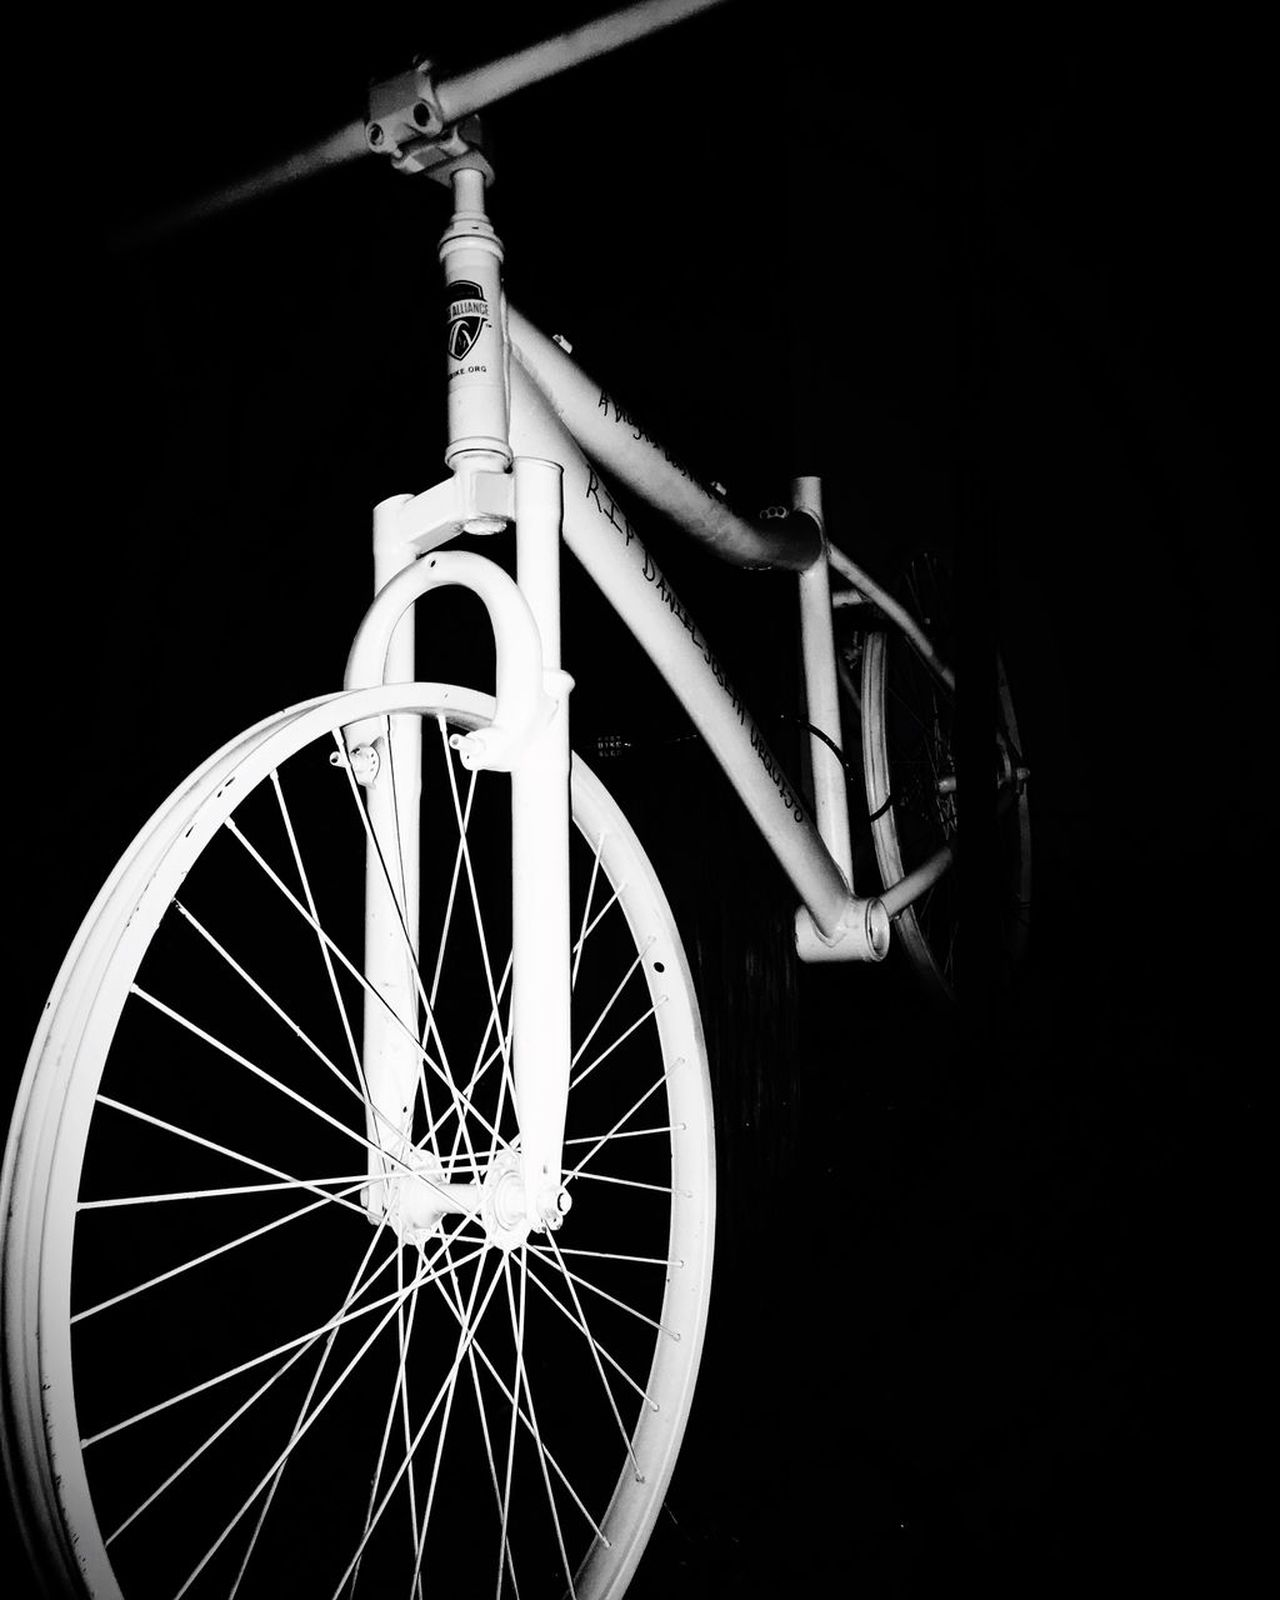 Bicycle Wheel No People Mode Of Transport Black Background Outdoors EyeEm Best Shots EyeEmBestPics EyeEmNewHere EyeEm Photooftheday Photography Blackandwhite Photography Neighborhood Map Black & White Black White Capture The Moment Taking Photos EyeEmNewHere